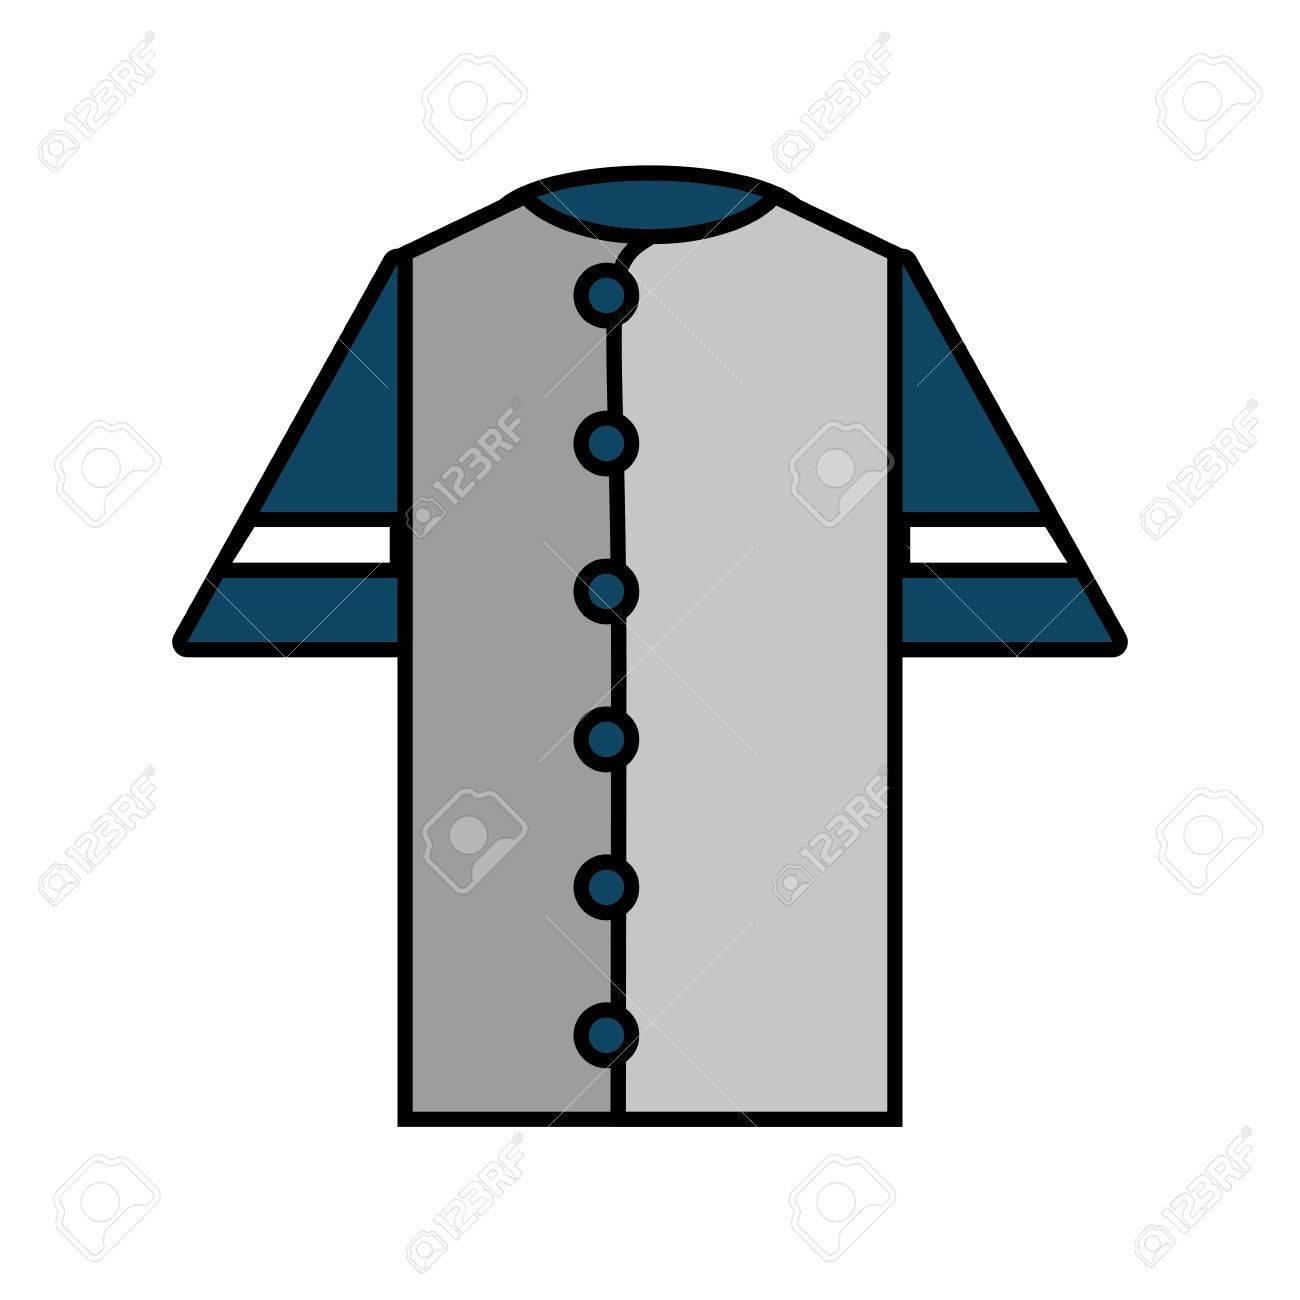 Shirt uniform design vector - Shirt Uniform Baseball Team Icon Vector Illustration Design Stock Vector 64373952